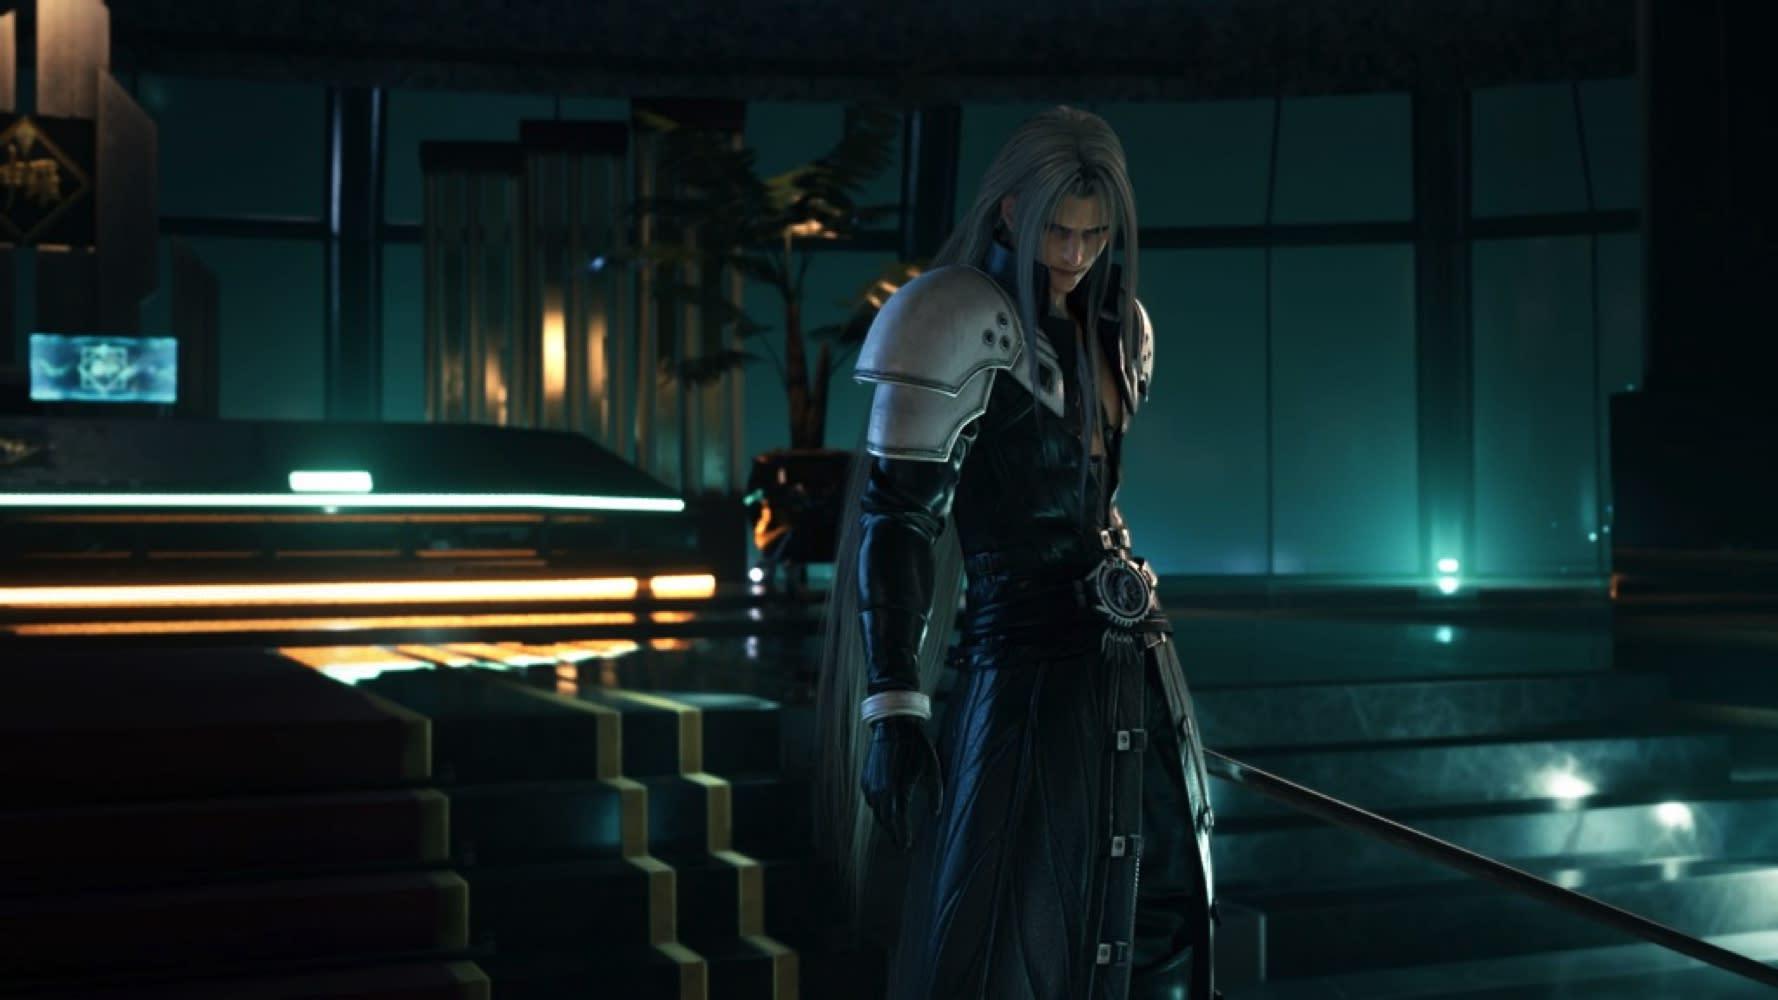 Final Fantasy VII Remake preview